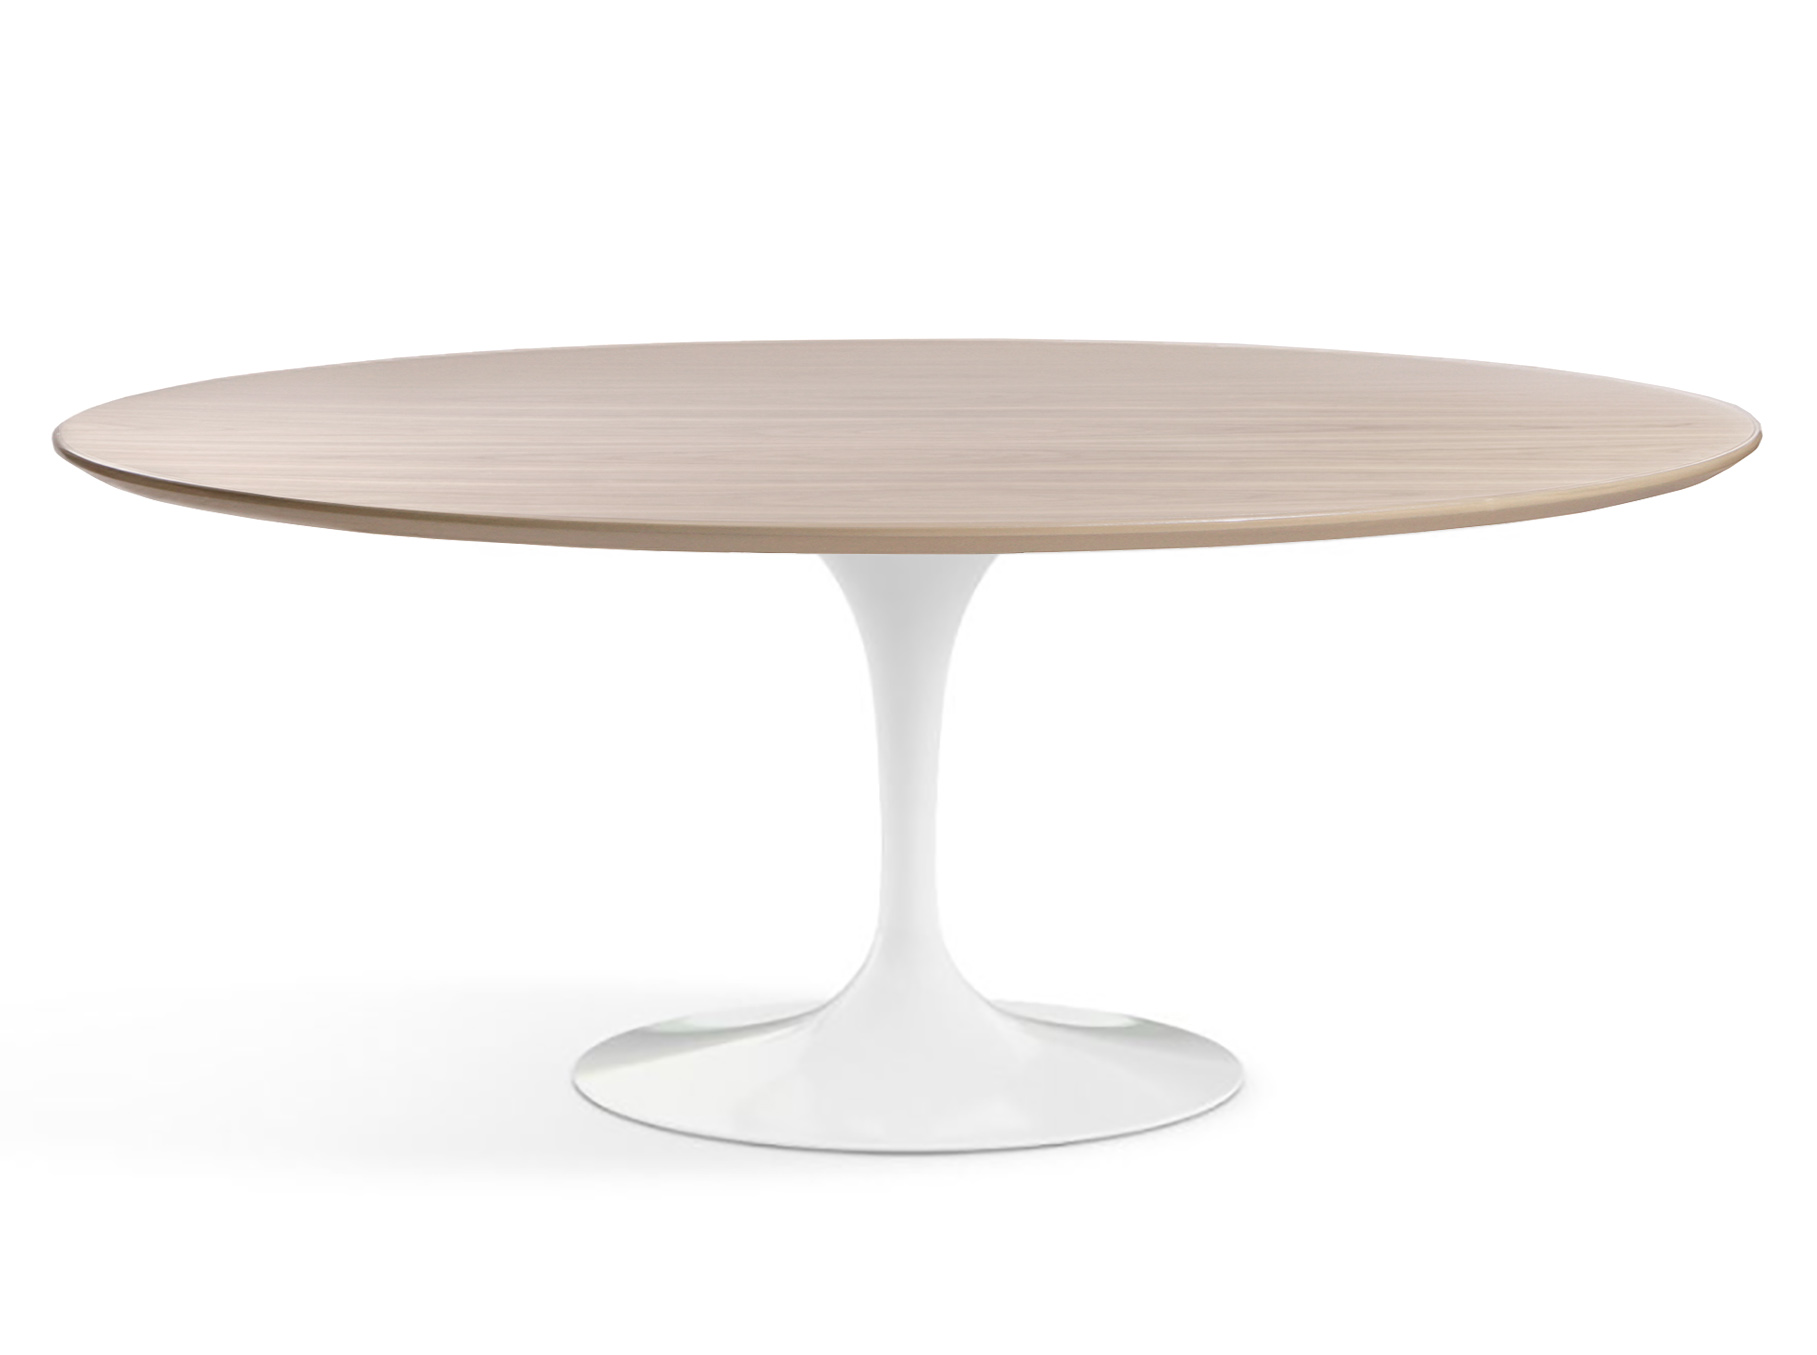 Кухонный стол ActualDesign 9981497 от thefurnish